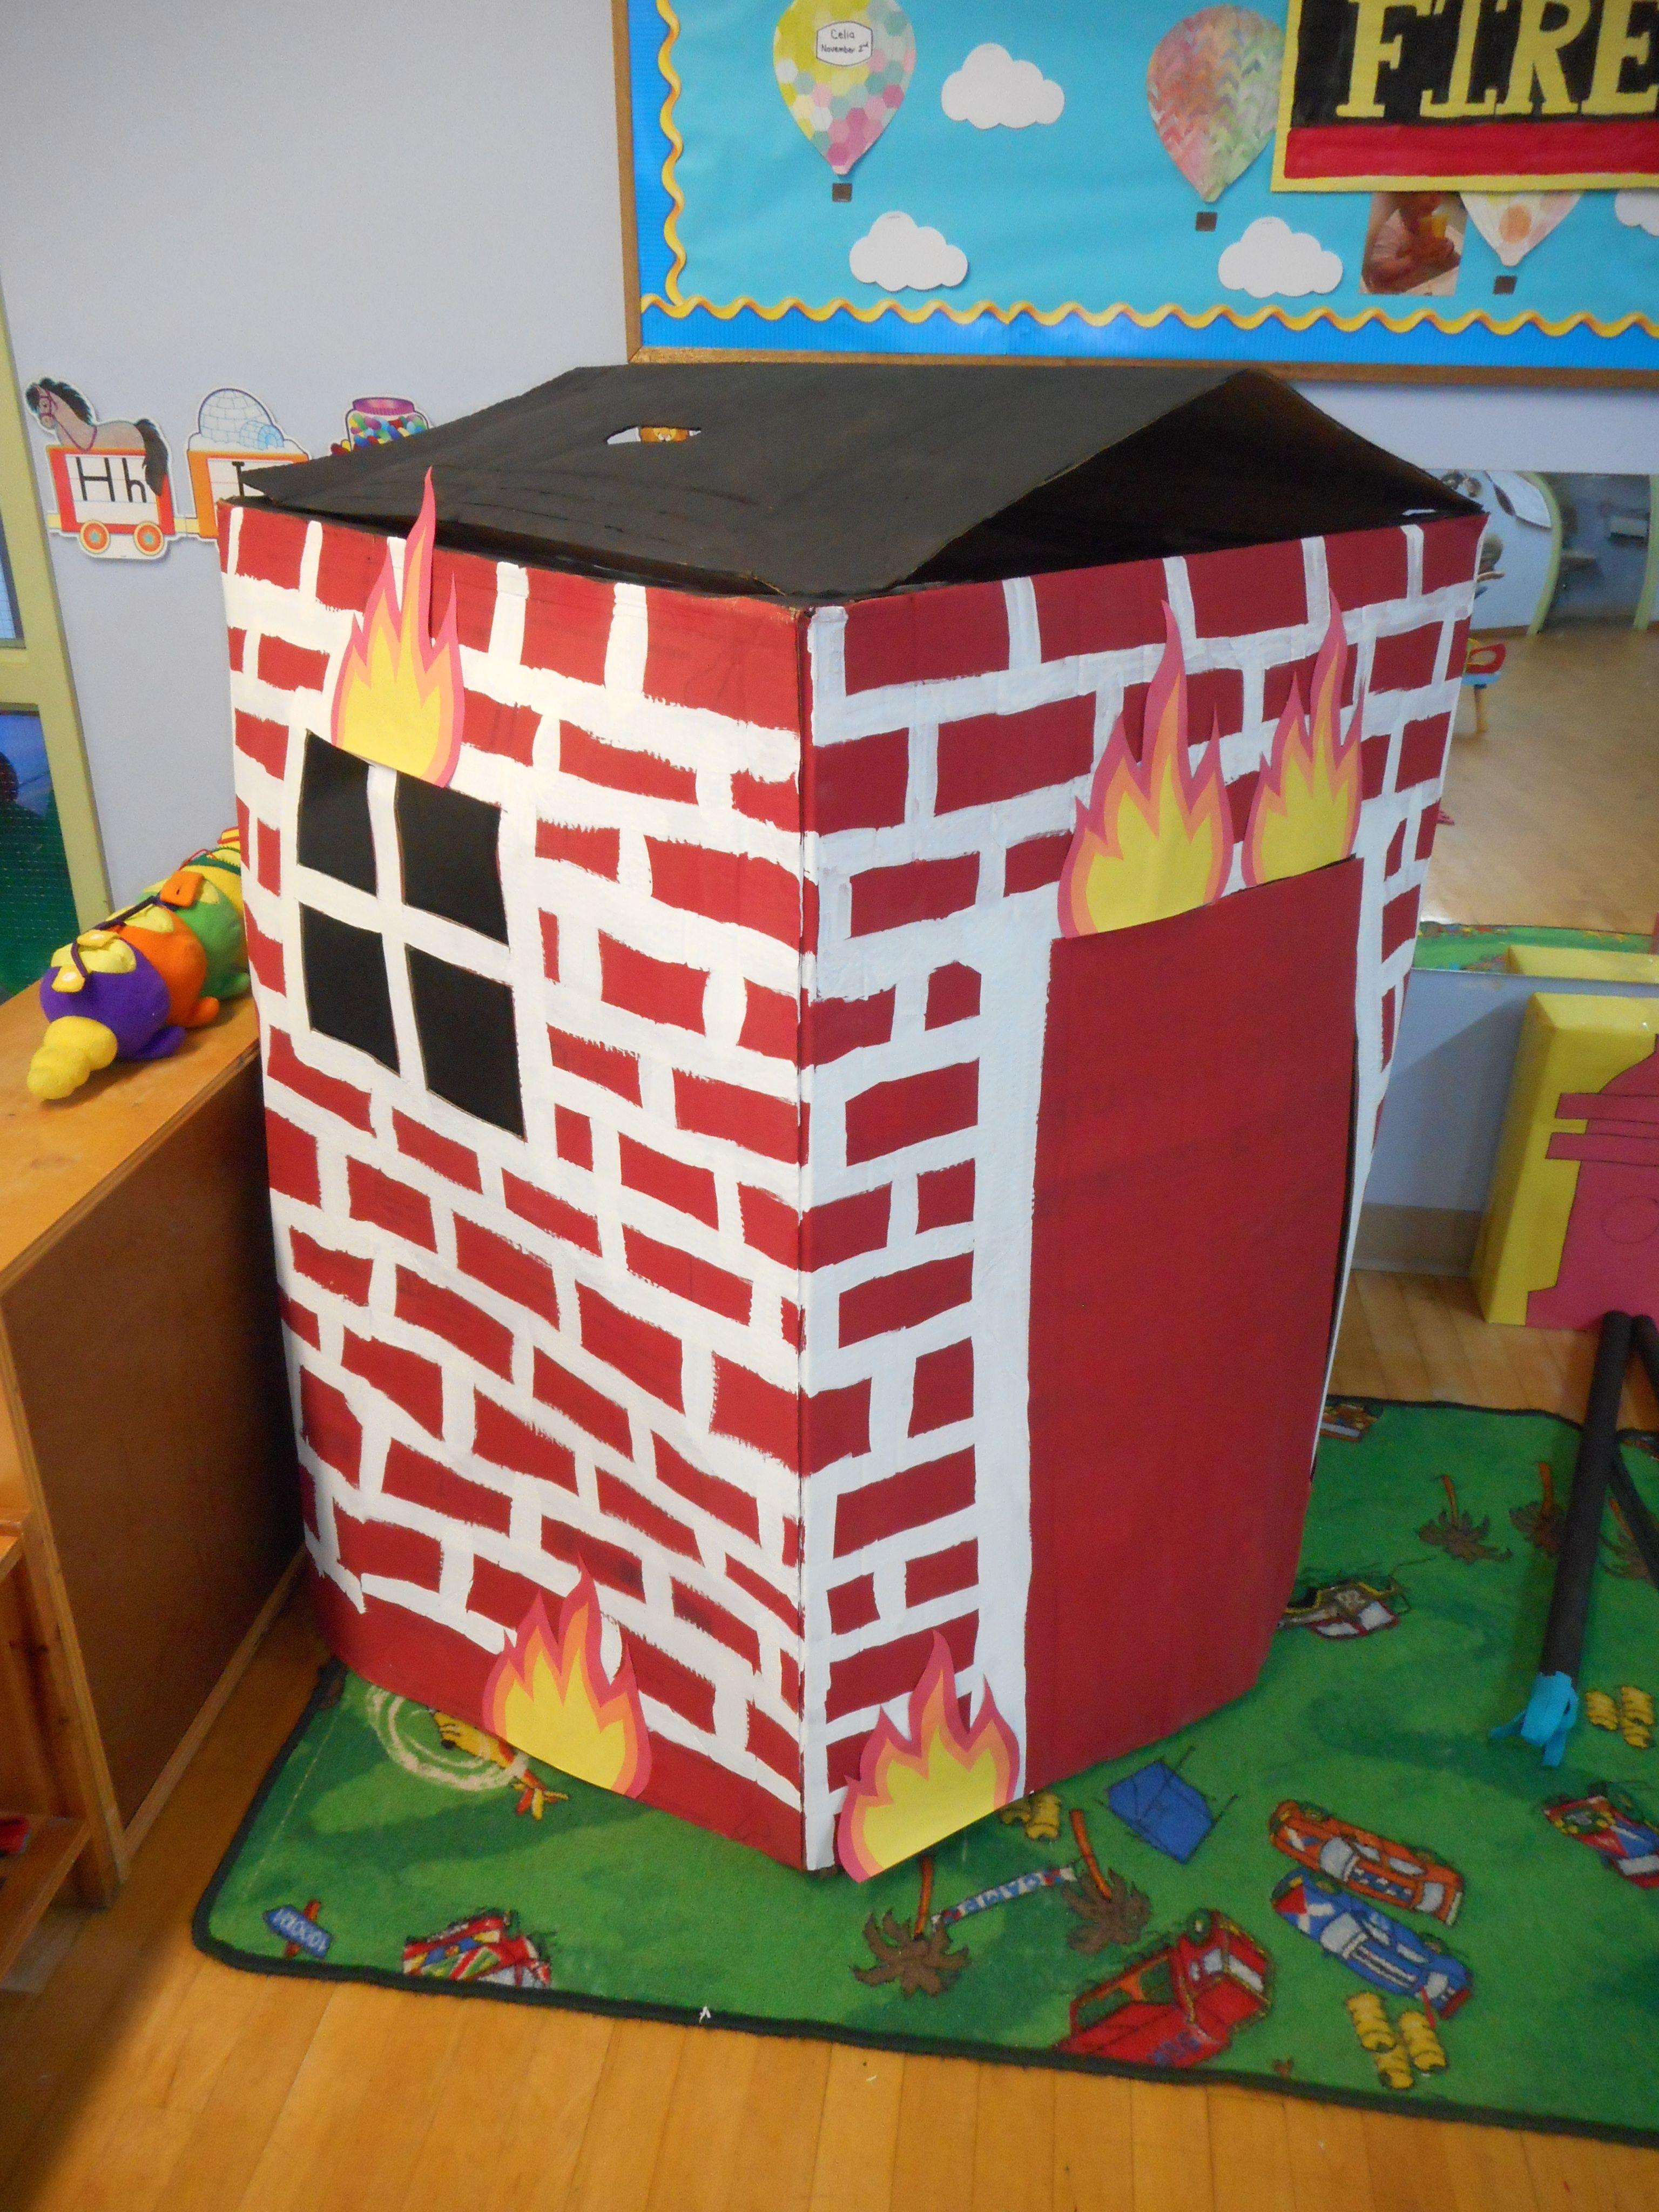 Fire Station Dramatic Play Diy Burning Building